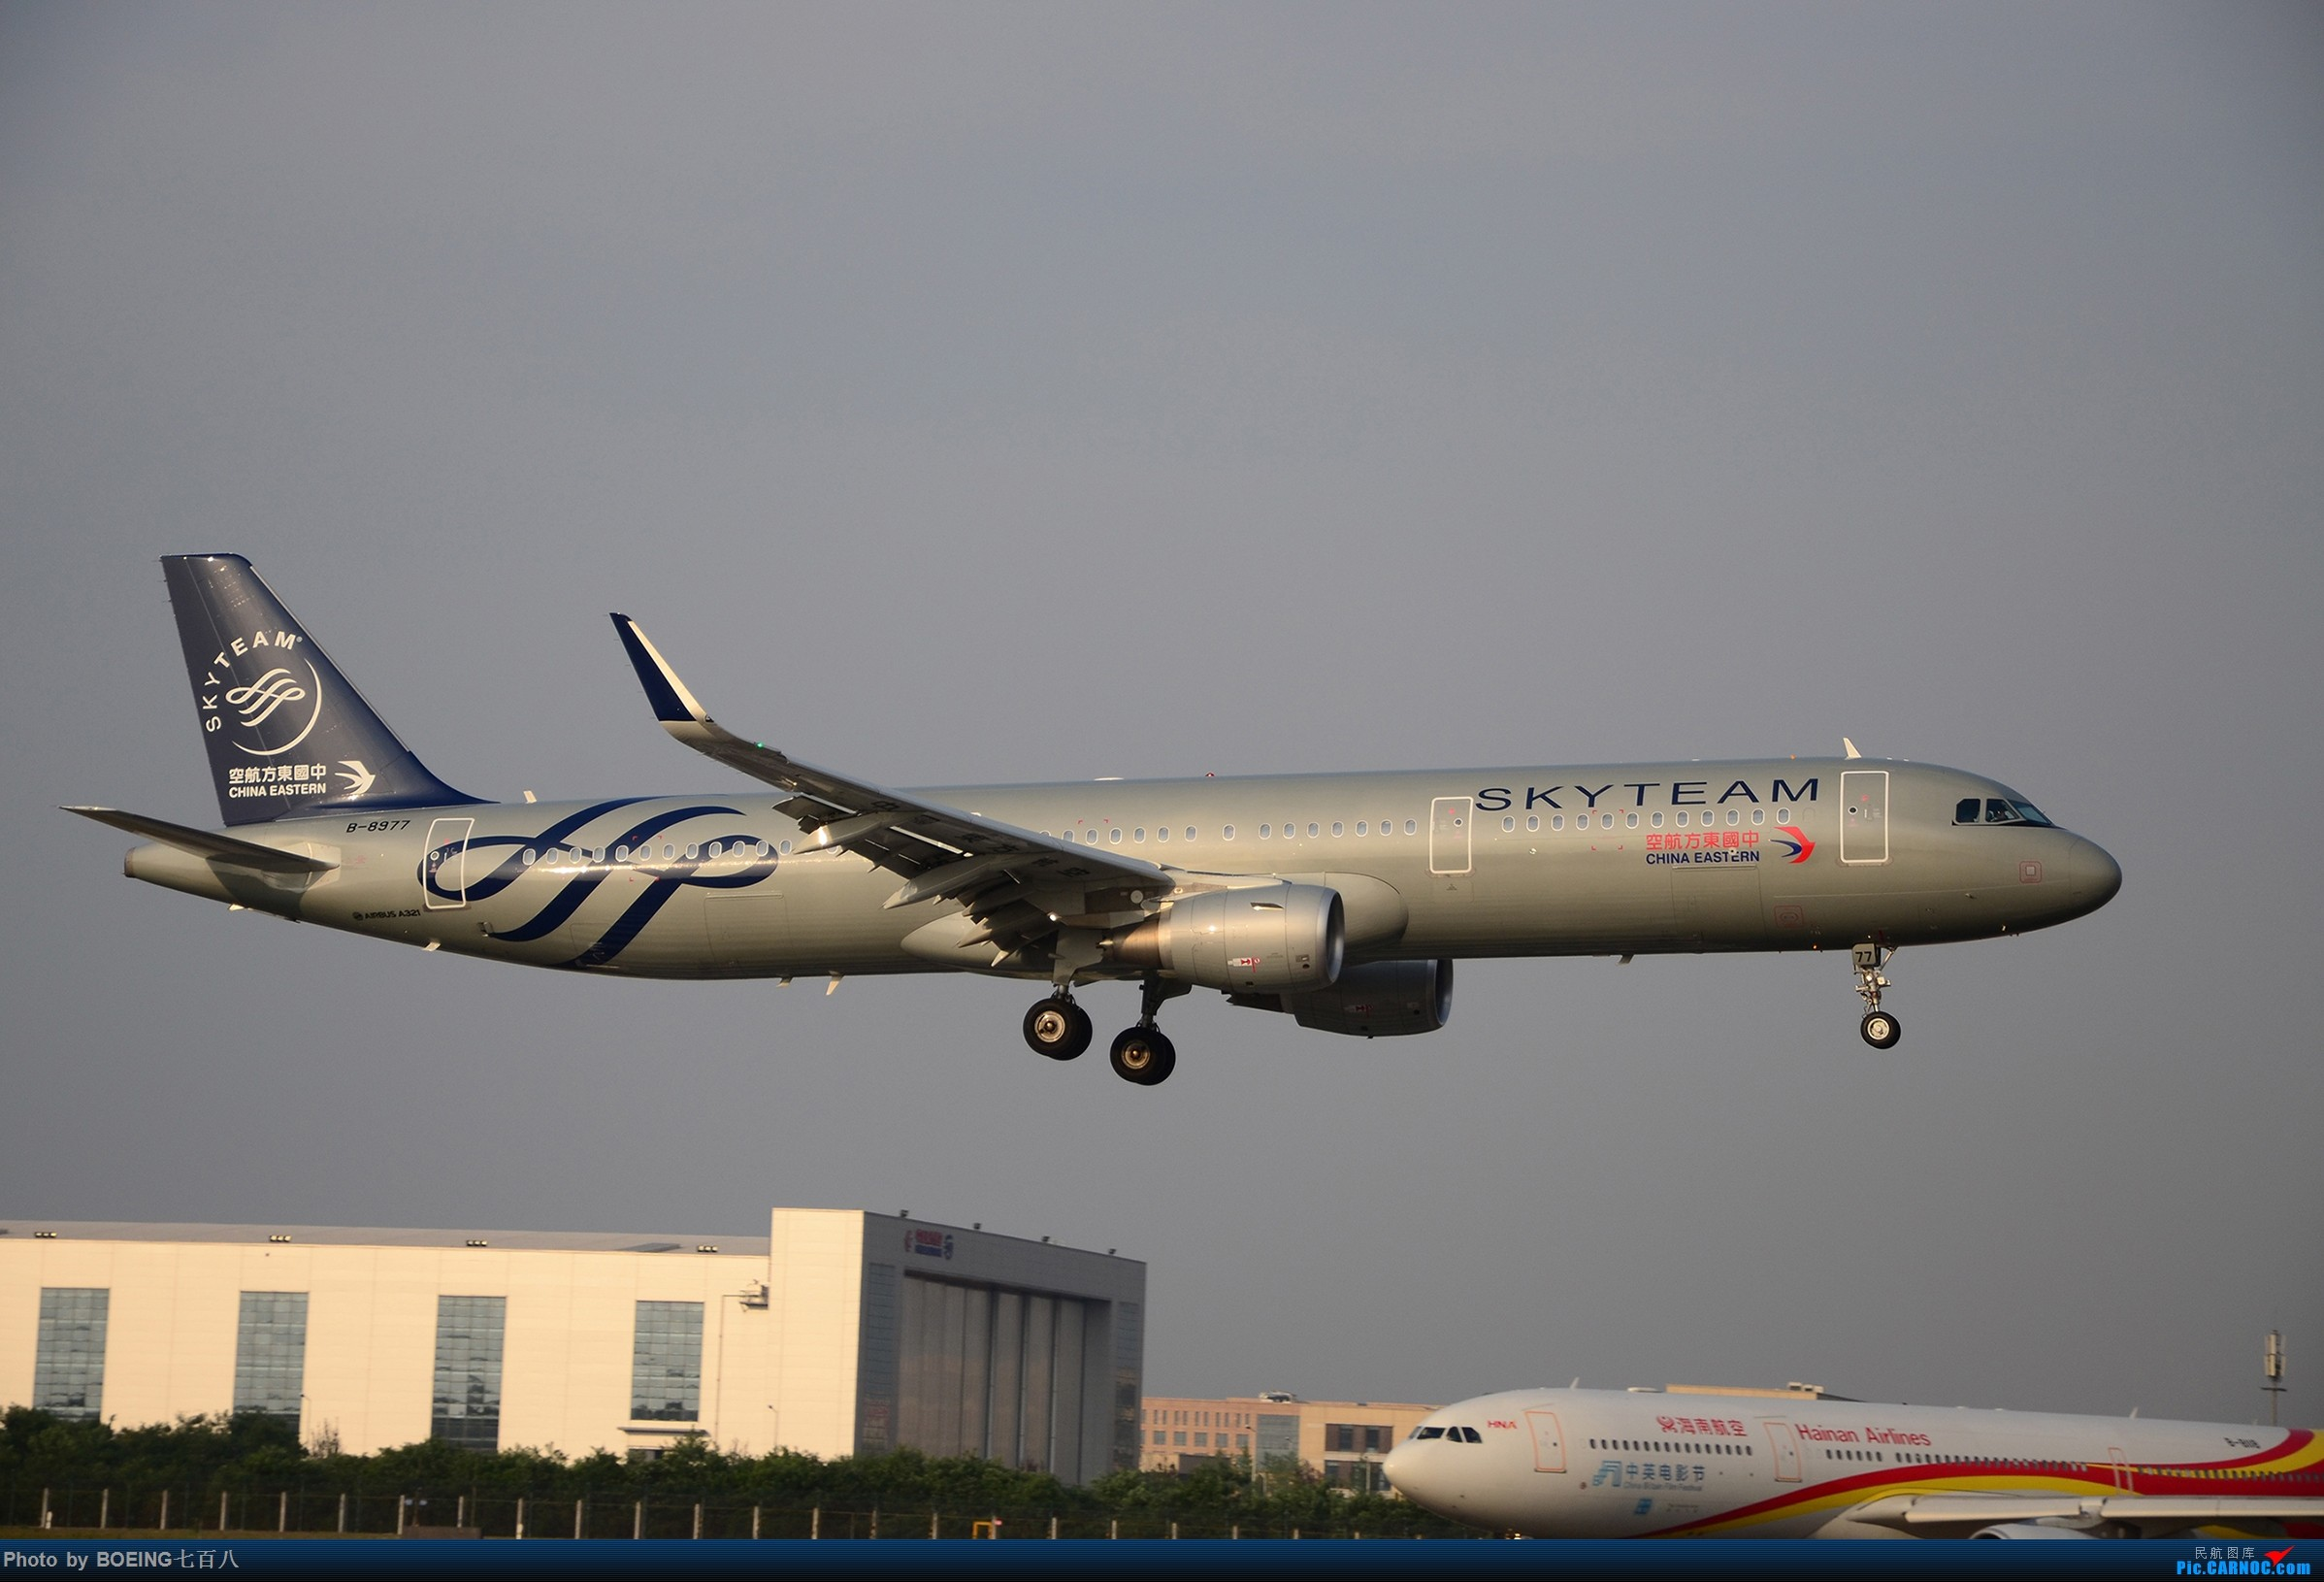 Re:[原创]海航家的黄焖熊猫和清蒸熊猫等好货 AIRBUS A321-200 B-8977 中国北京首都国际机场